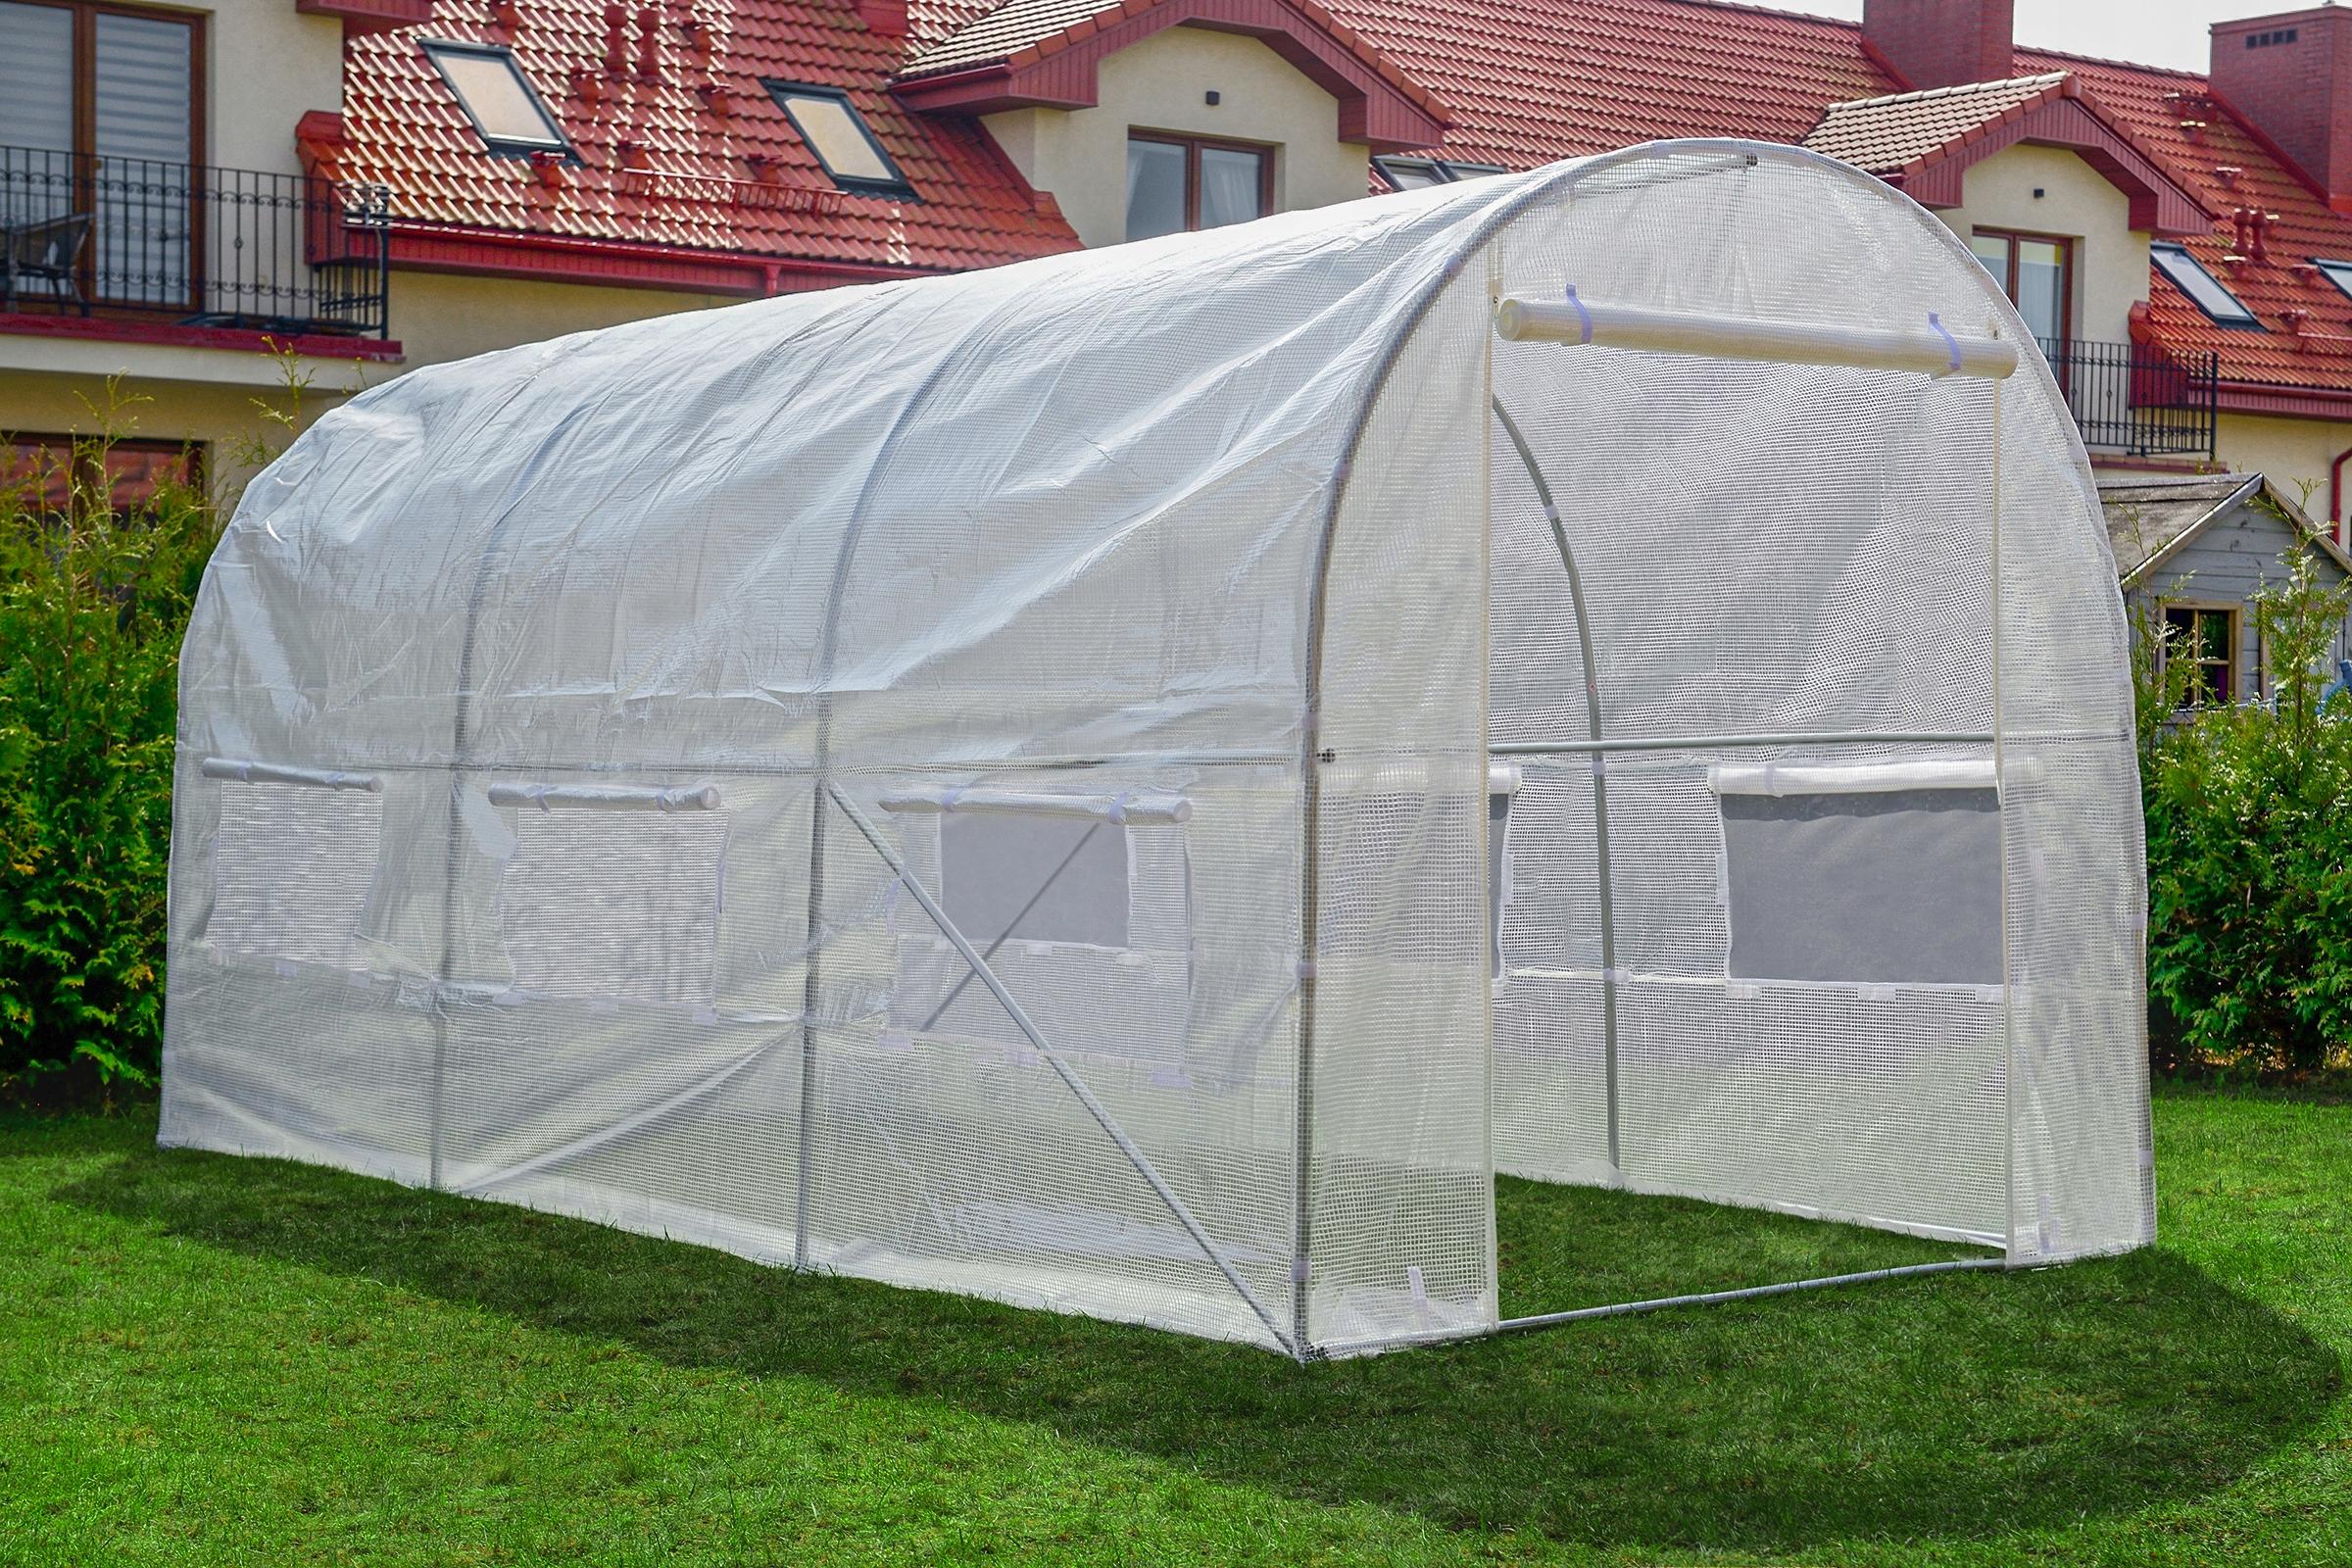 FÓLIOVÝ TUNEL 10m2 ZAHRADA GREENHOUSE 4x2,5m UV-4 Výrobca Funfit Garden